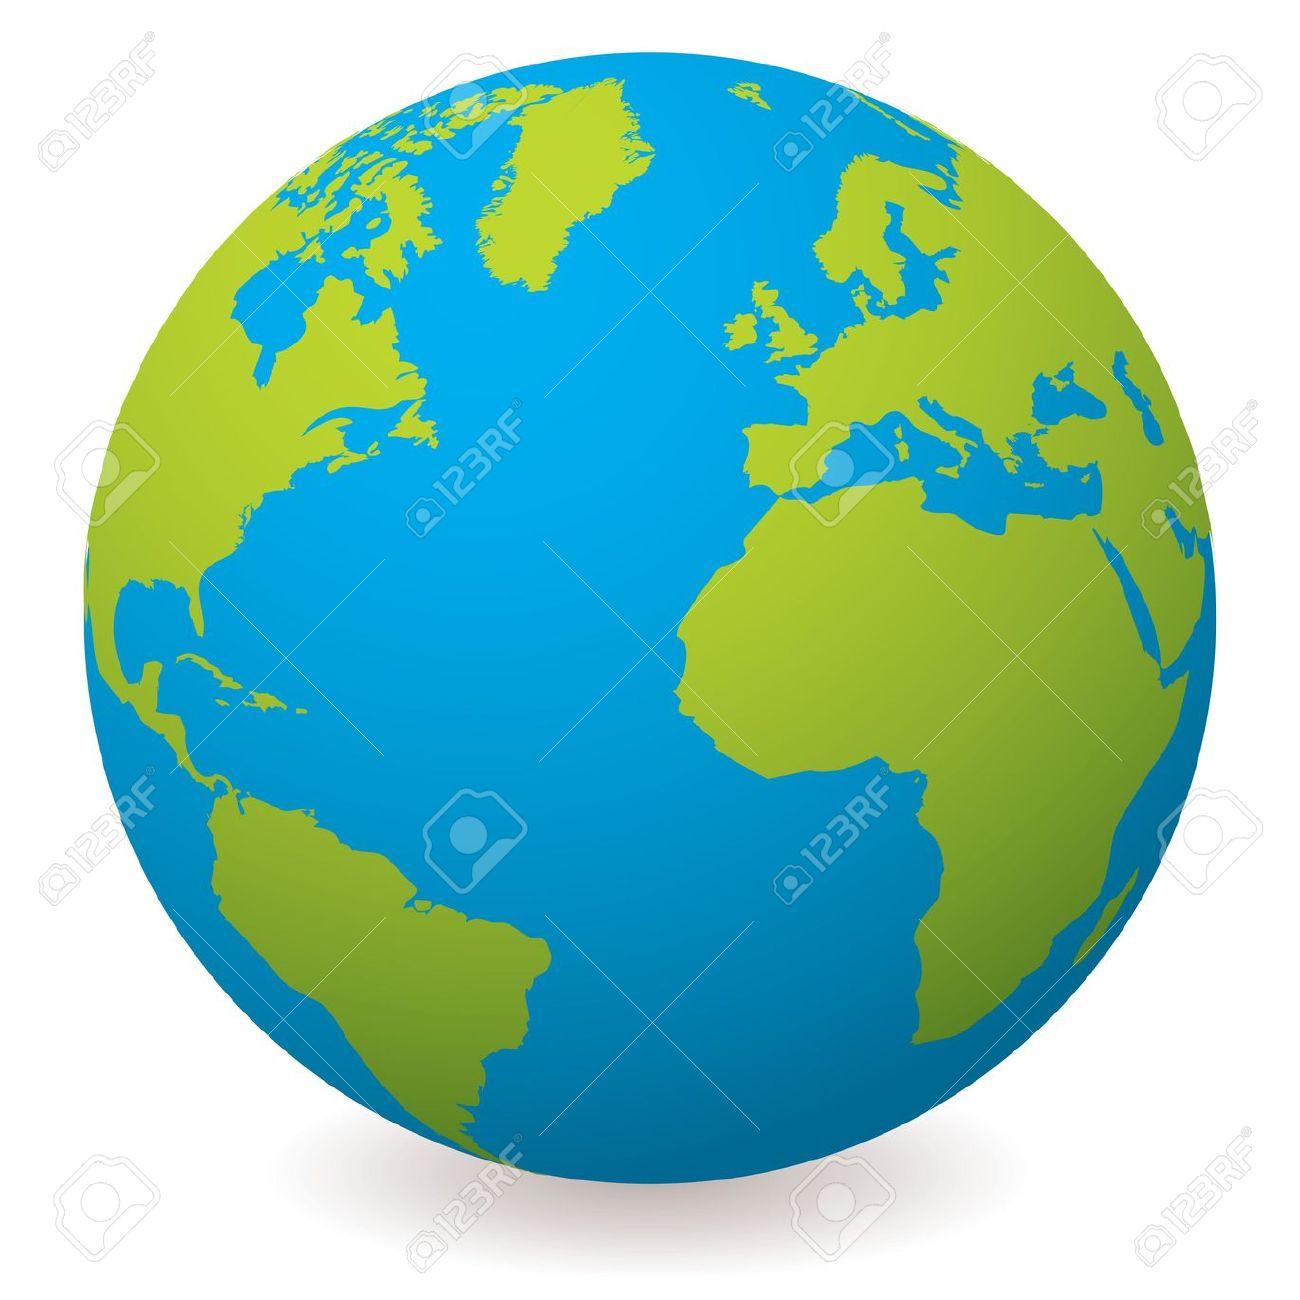 globe clipart cdr - photo #8